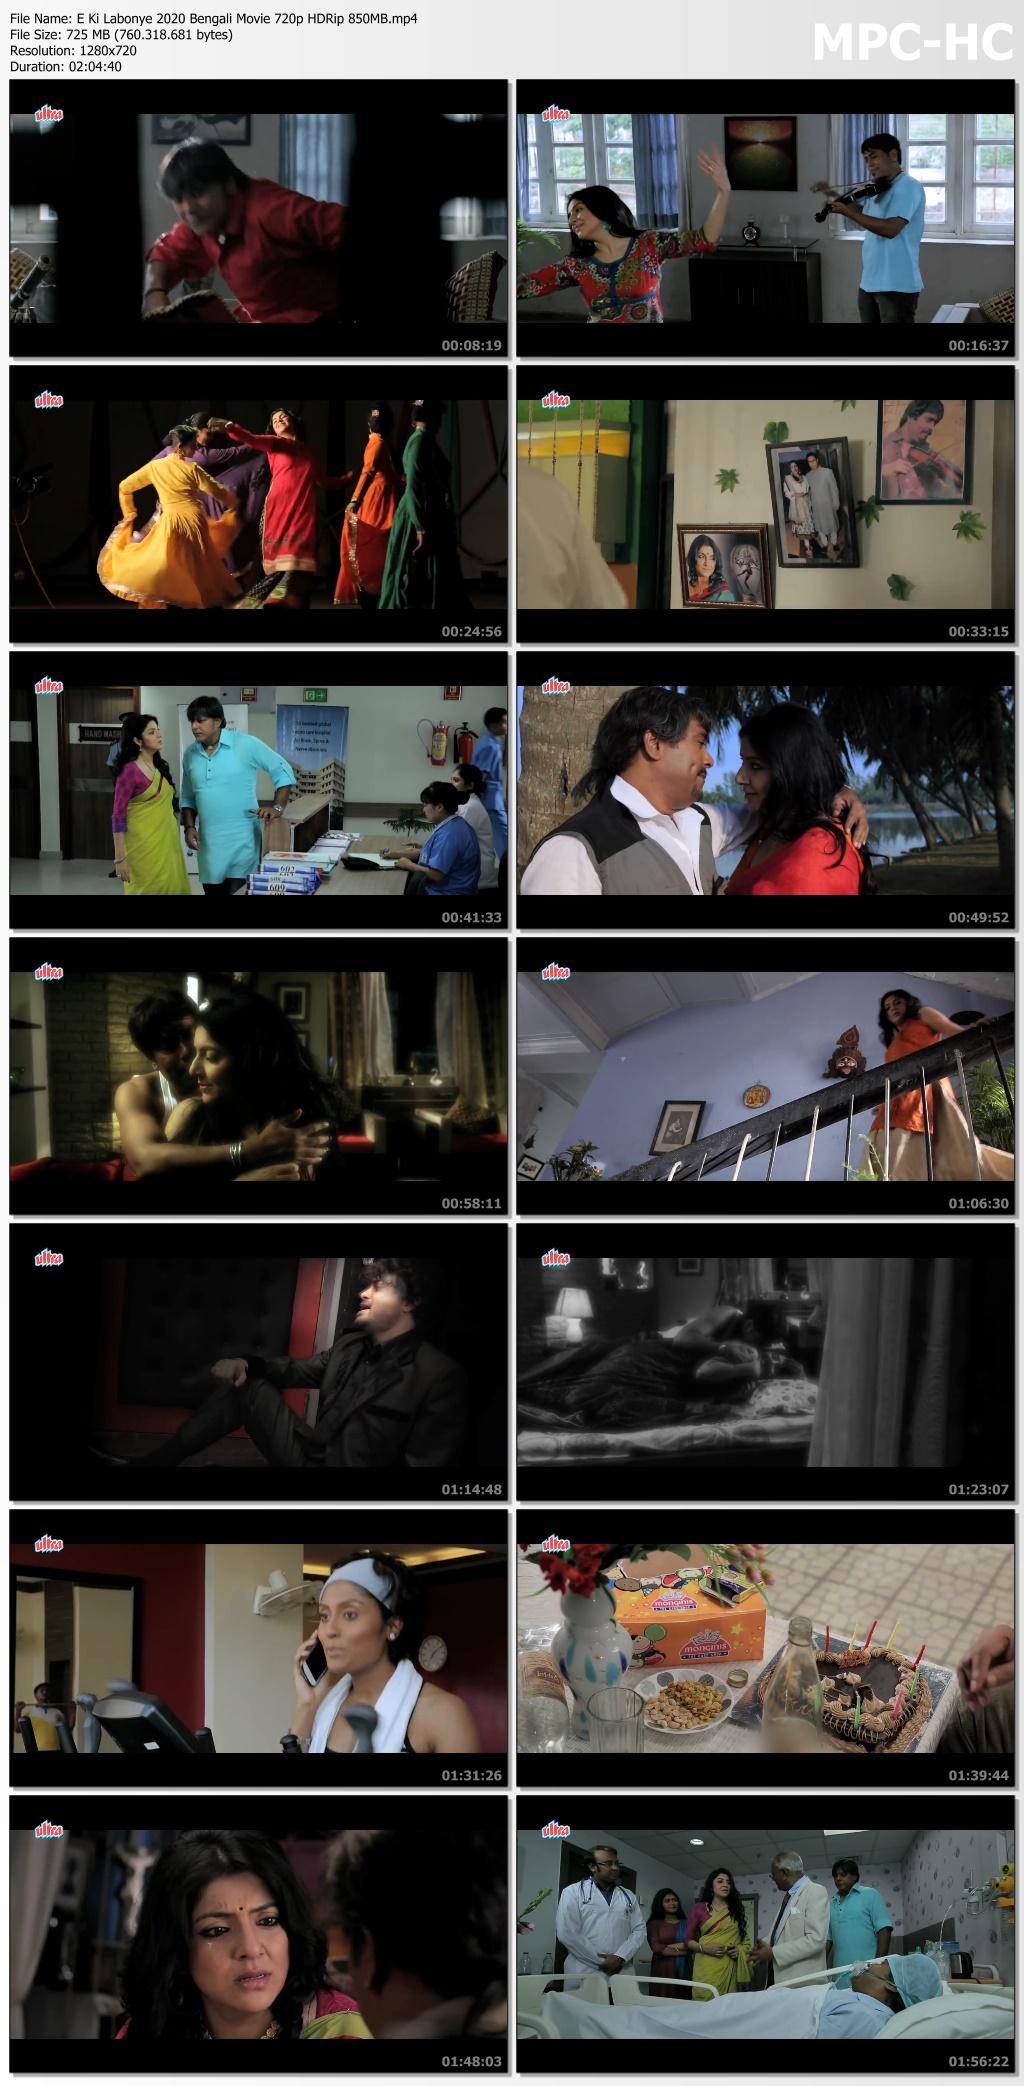 E-Ki-Labonye-2020-Bengali-Movie-720p-HDRip-850-MB-mp4-thumbs